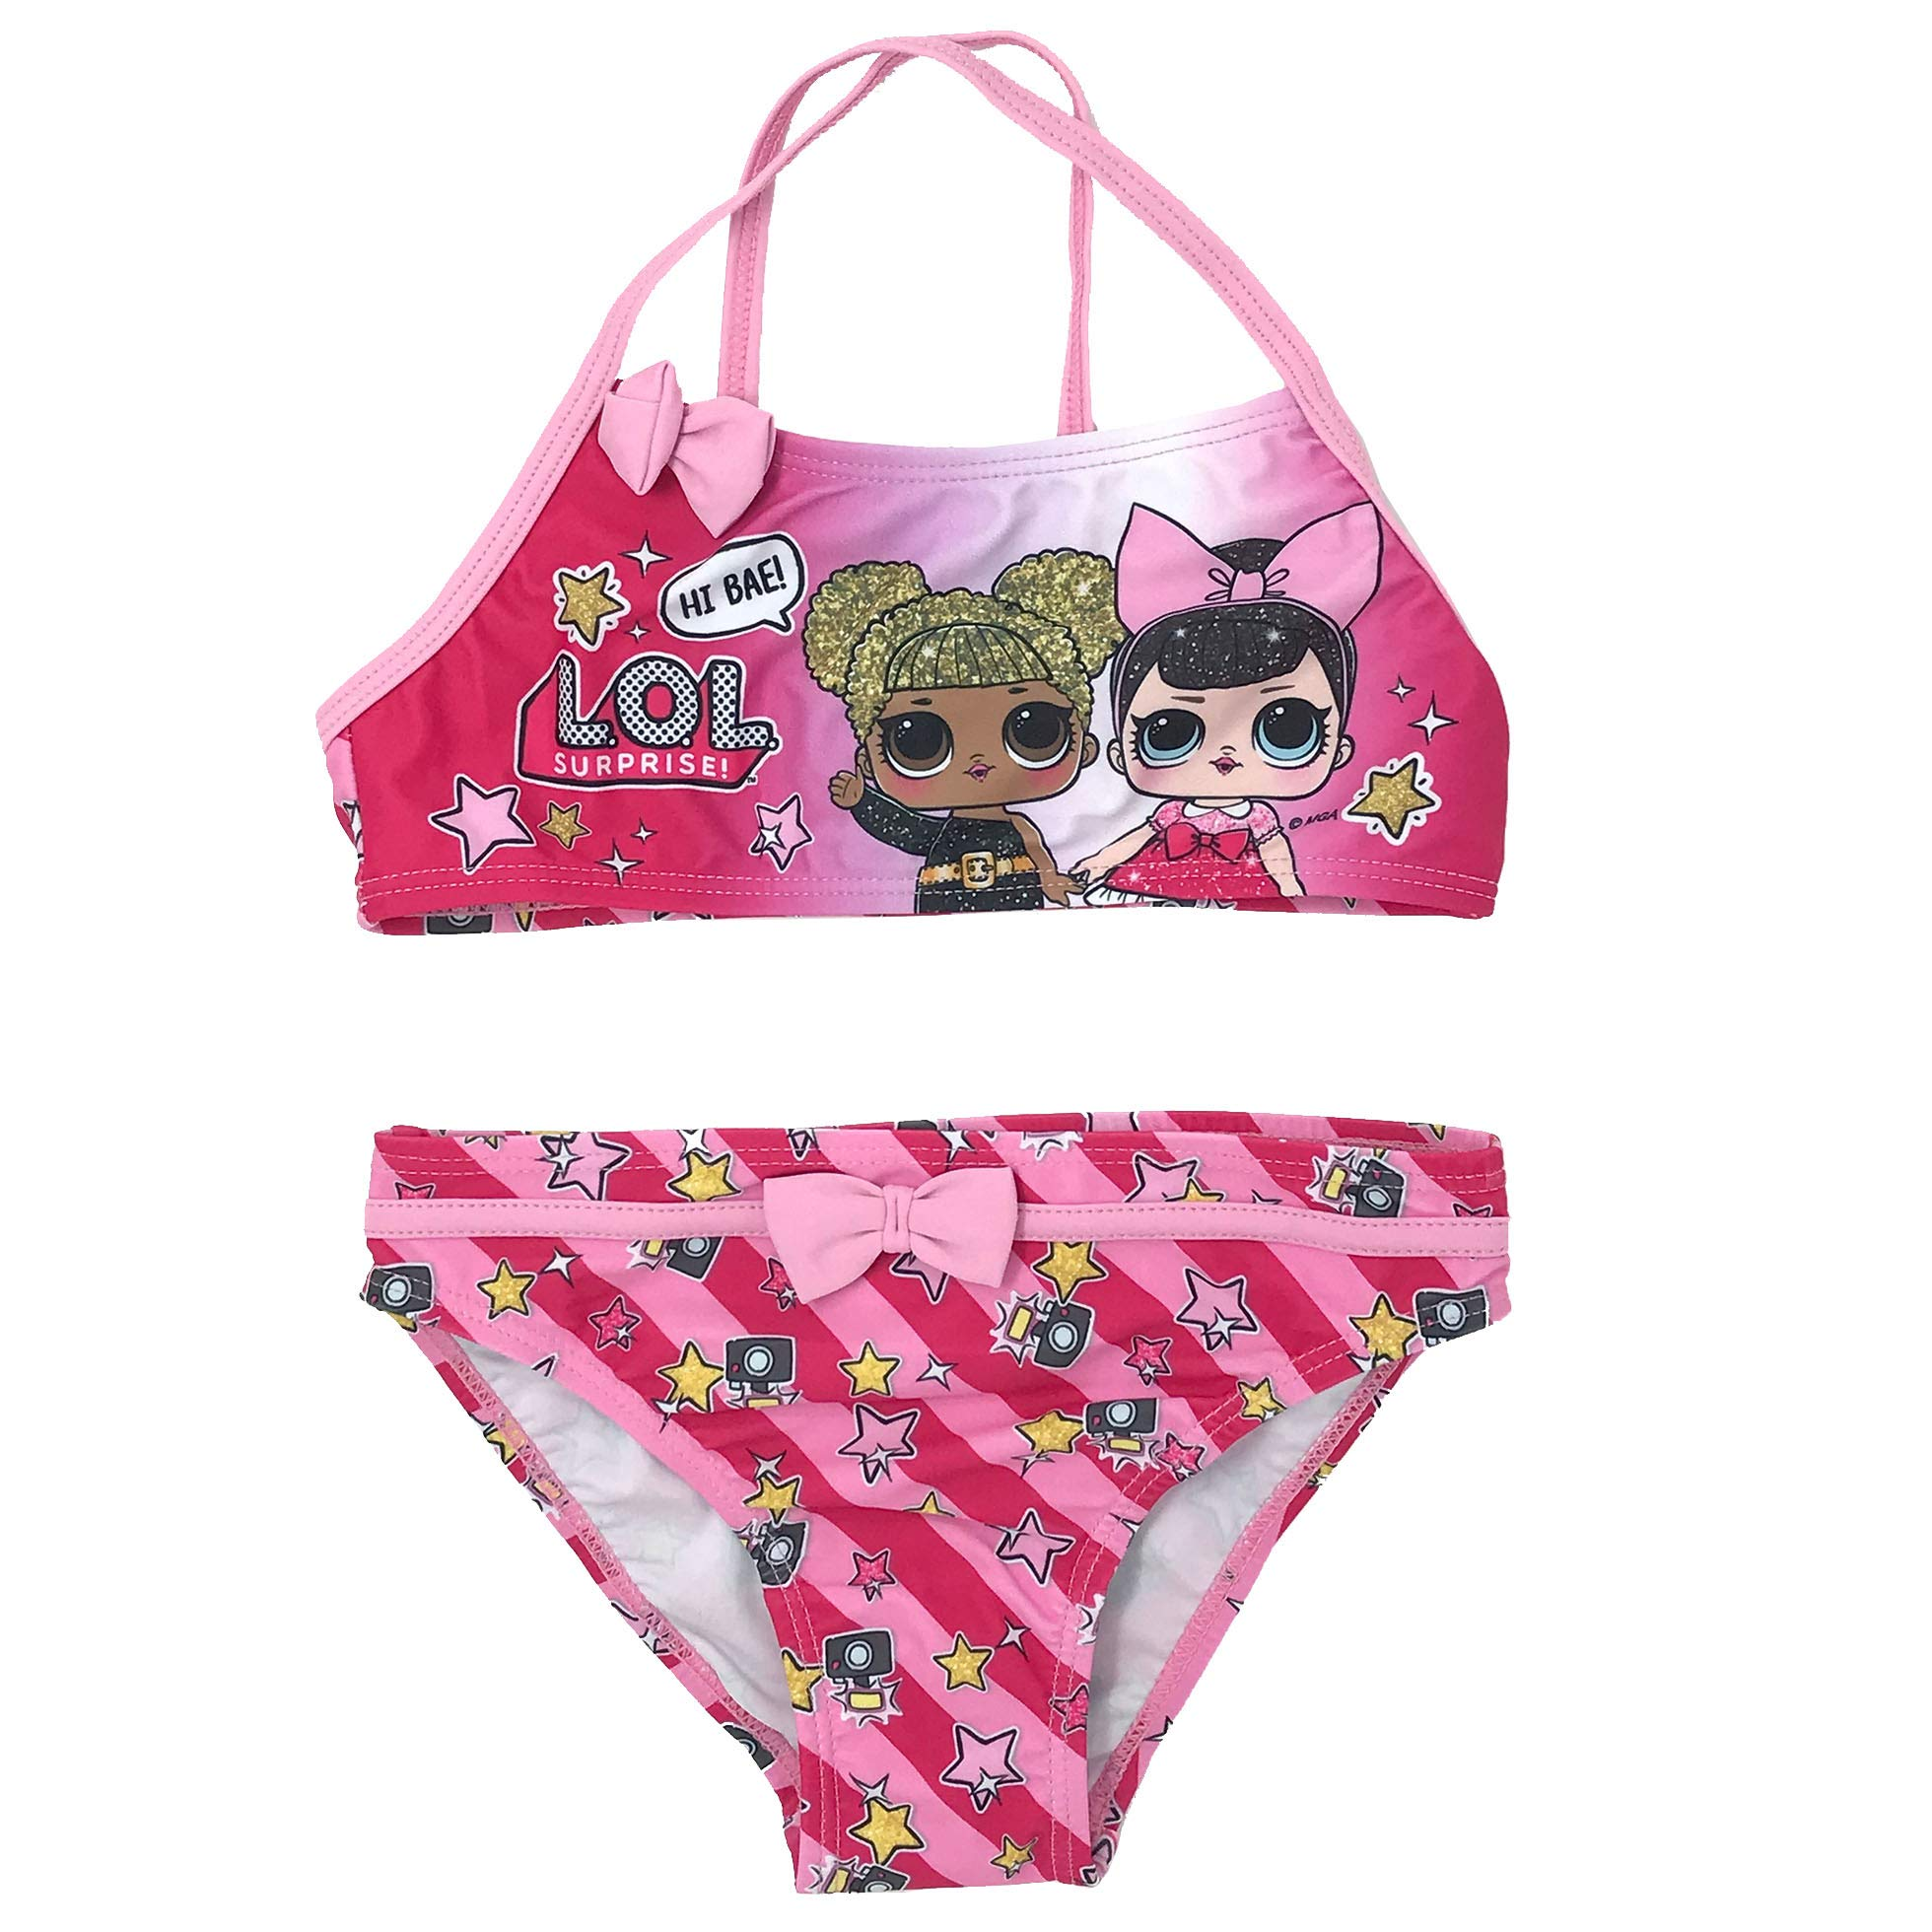 Poliestere Bikini Bambina Entertainment LOL Surprise ET1813 Costume Due Pezzi